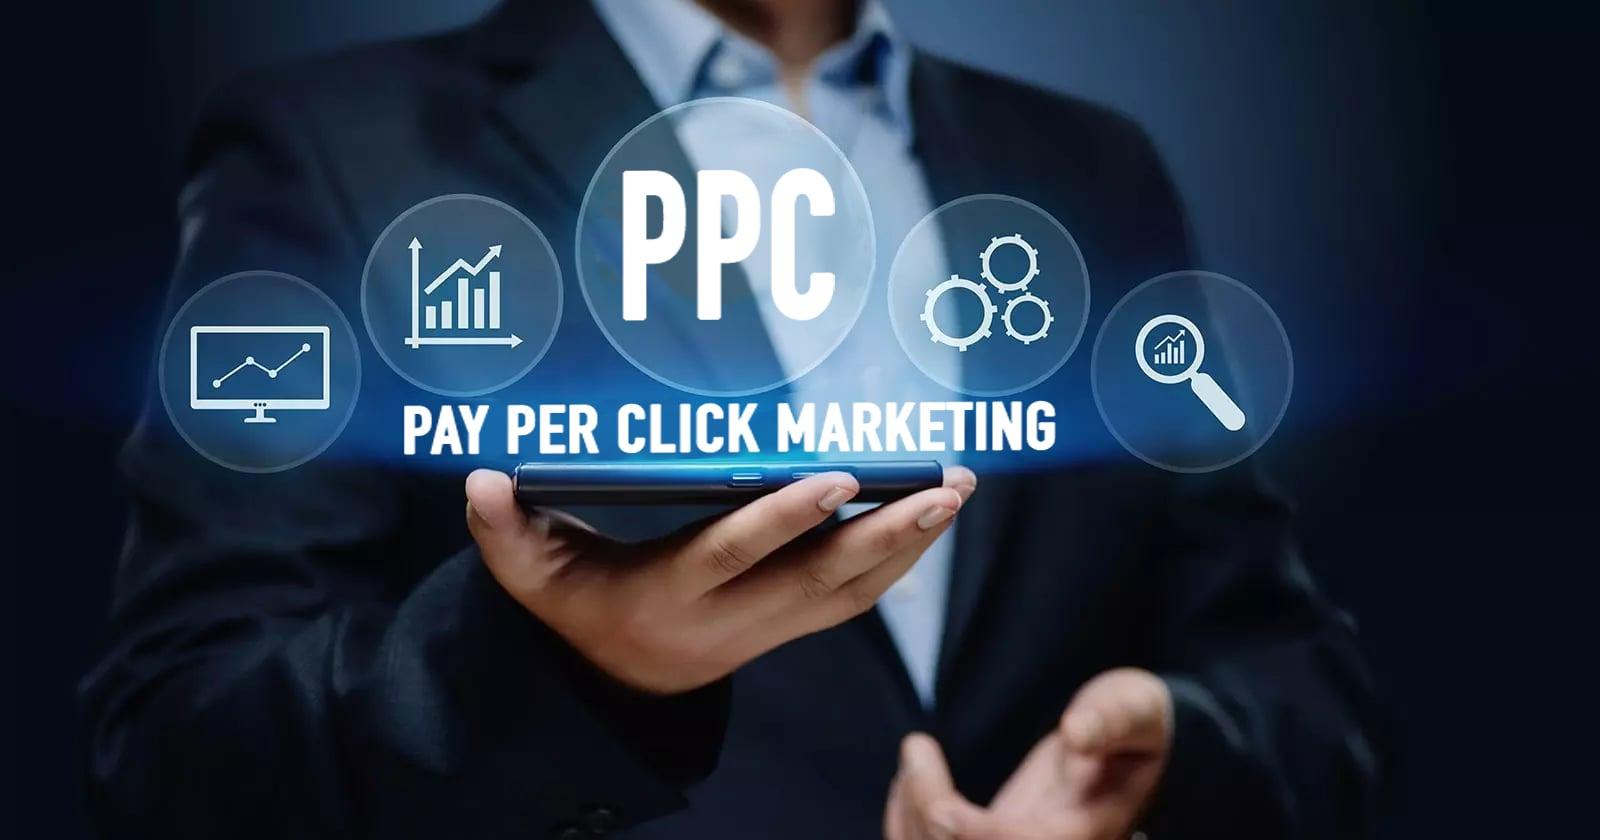 Pay Per Click Marketing (PPC)